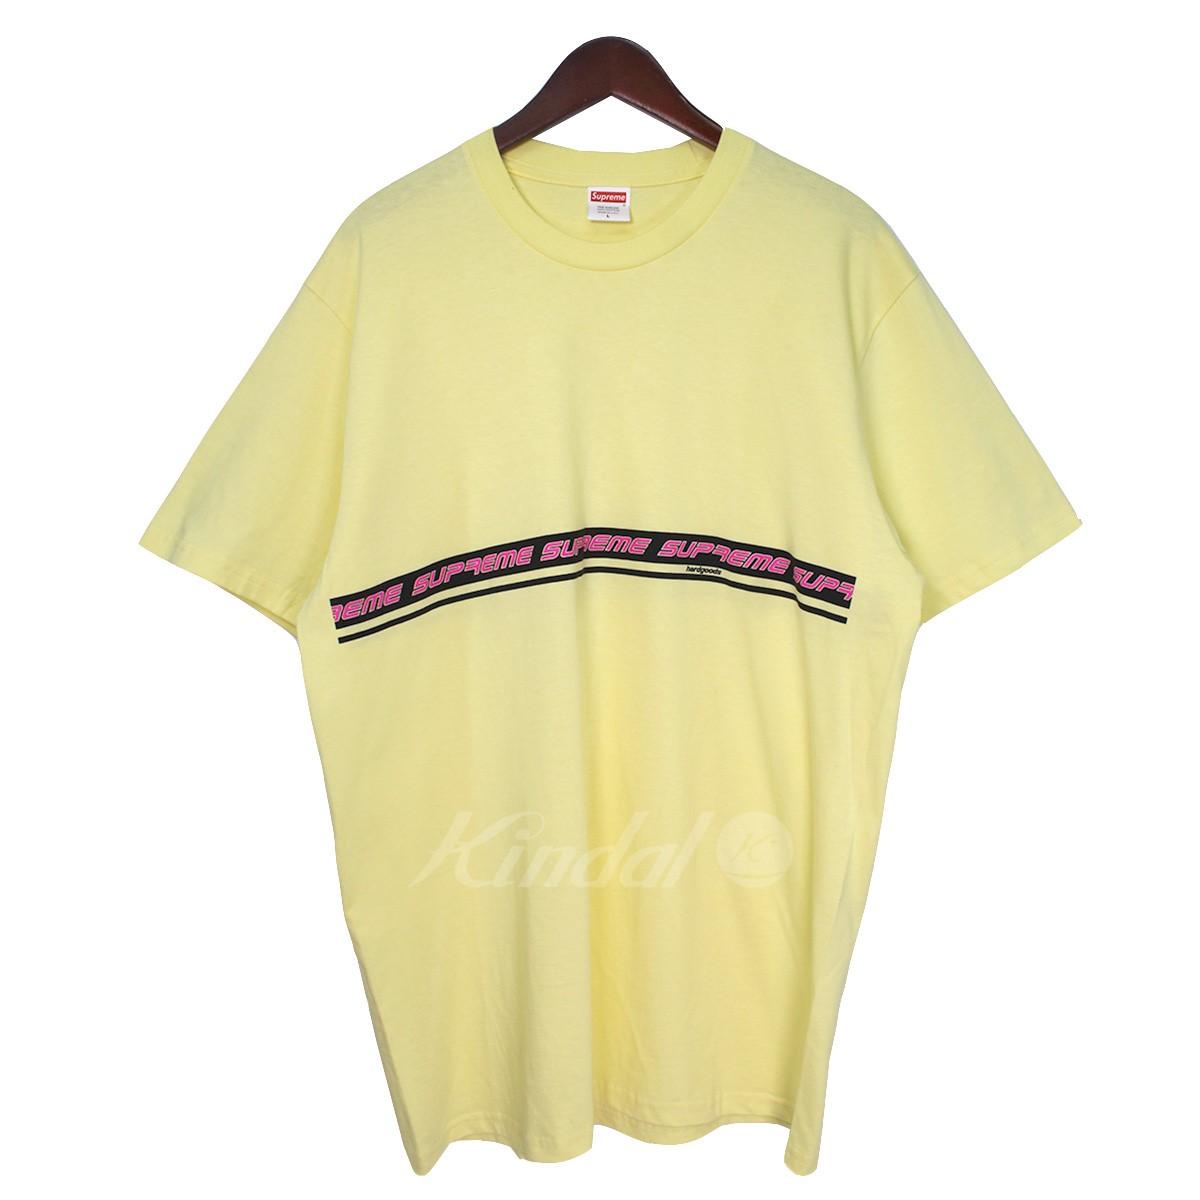 3dae04f39b3b SUPREME 19SS Hard Goods Tee hard goods line logo T-shirt yellow size: L ...